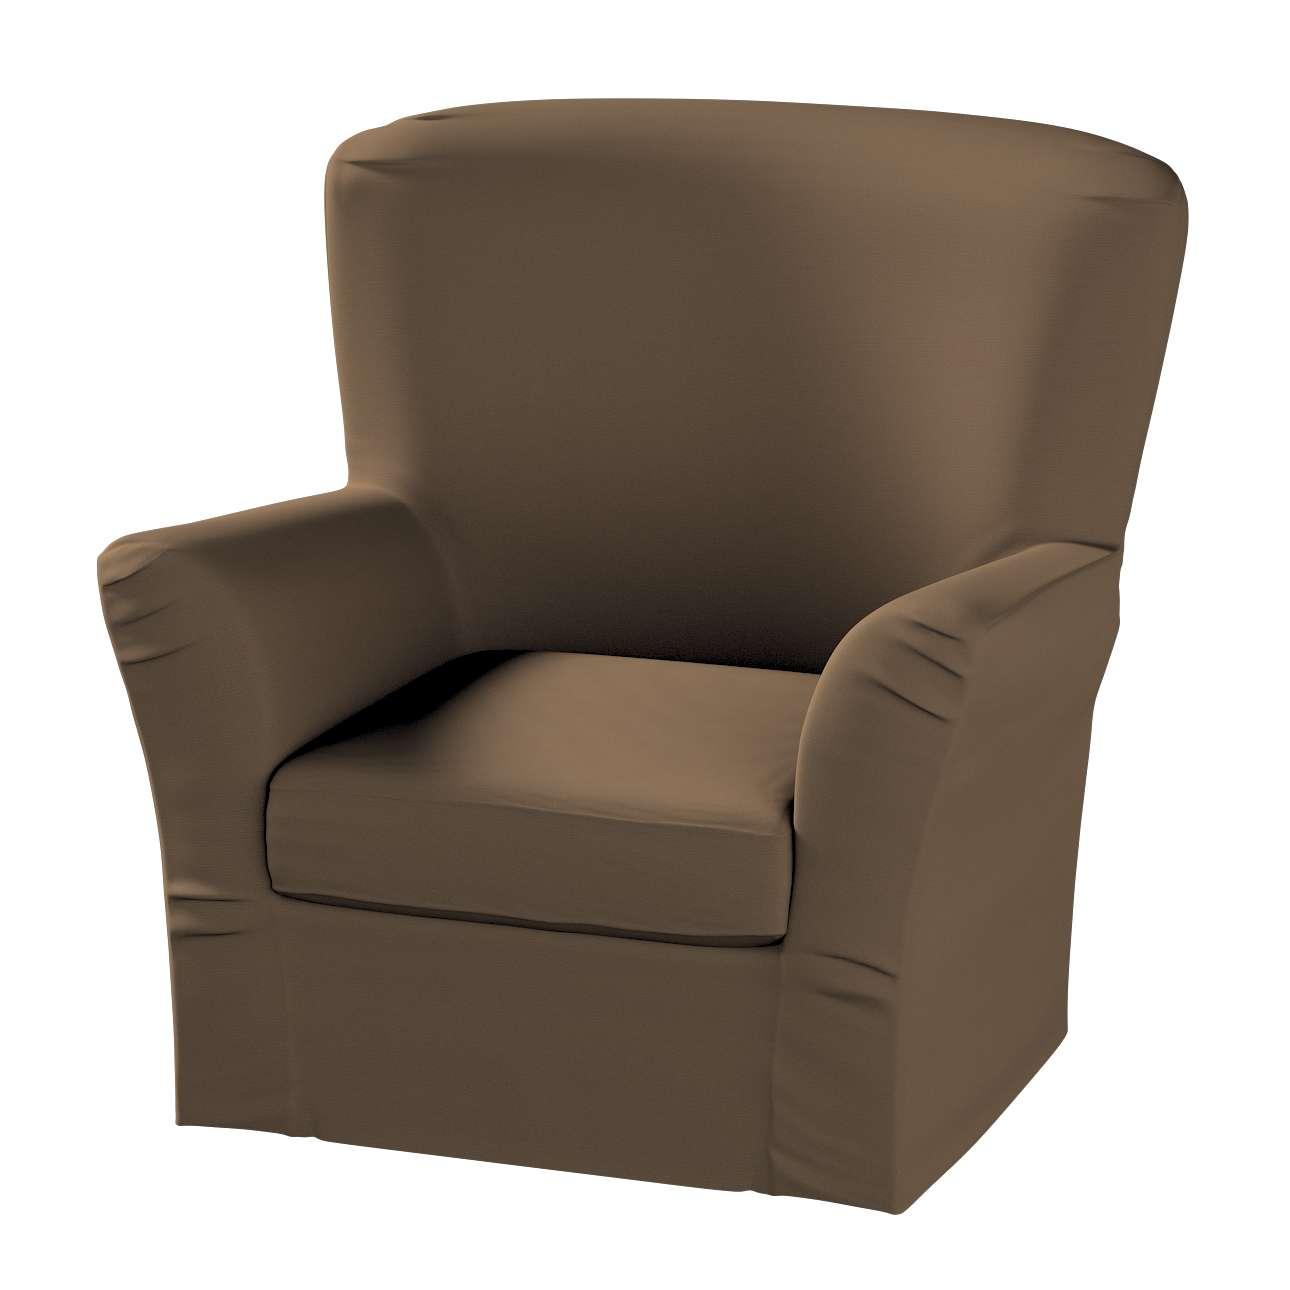 TOMELILLA fotelio užvalkalas TOMELILLA fotelis kolekcijoje Cotton Panama, audinys: 702-02